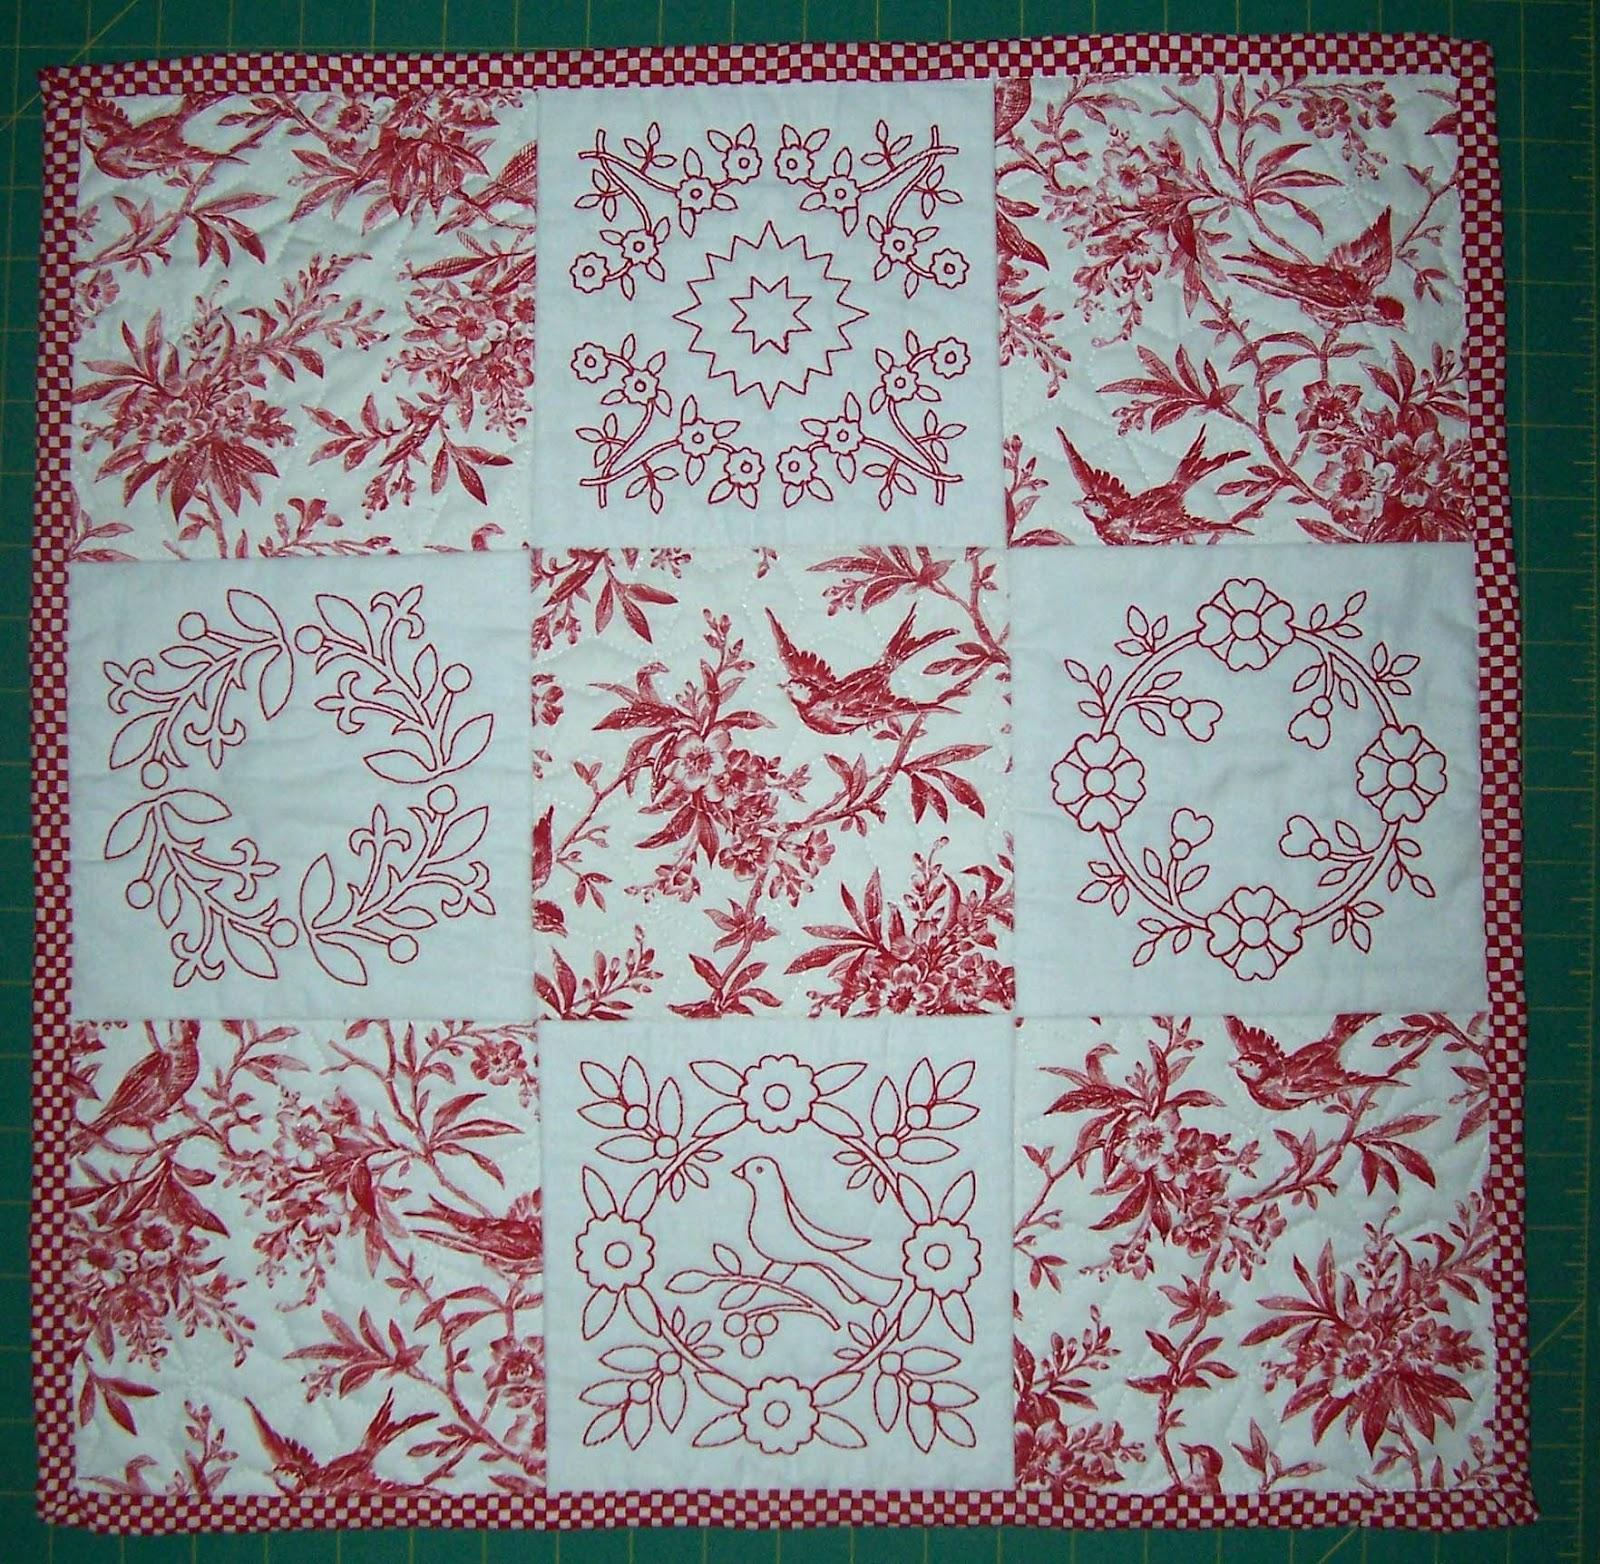 Redwork Quilting Patterns : Treasures-n-Textures: Mini-Redwork Quilt